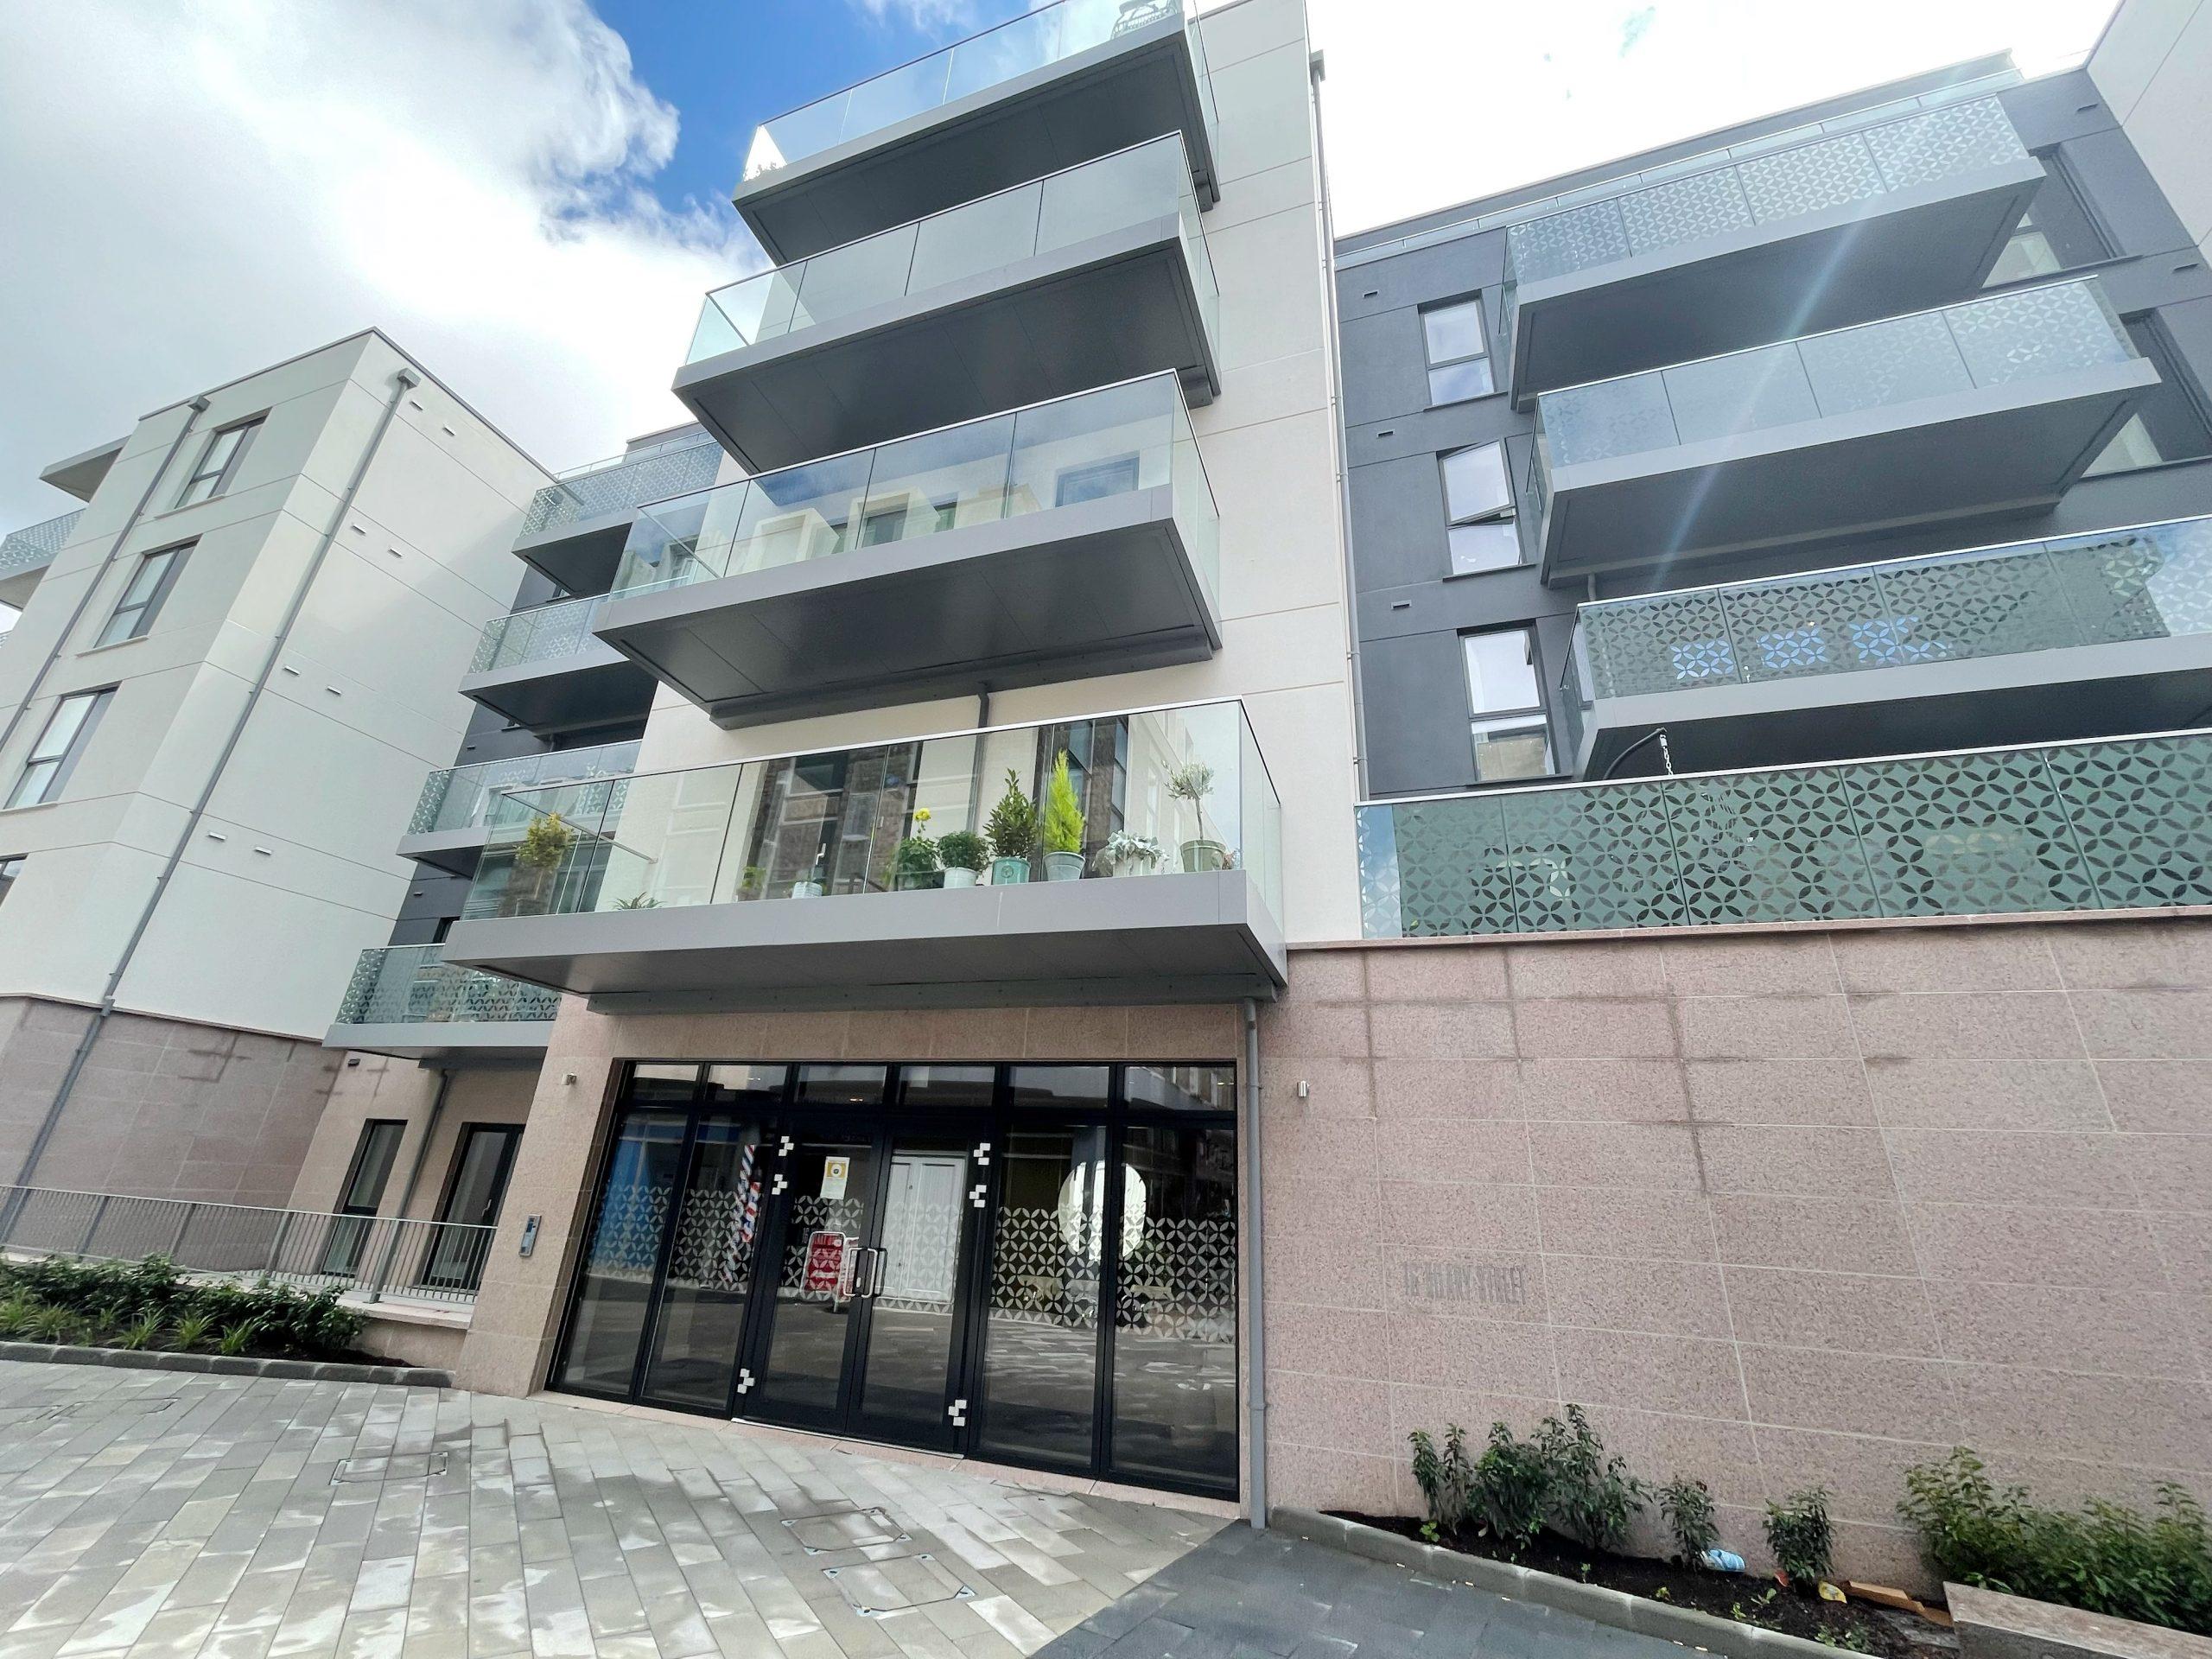 Contemporary New Ground Floor Dandara Build, 2 Bedroom Apartment, with Huge Patio!